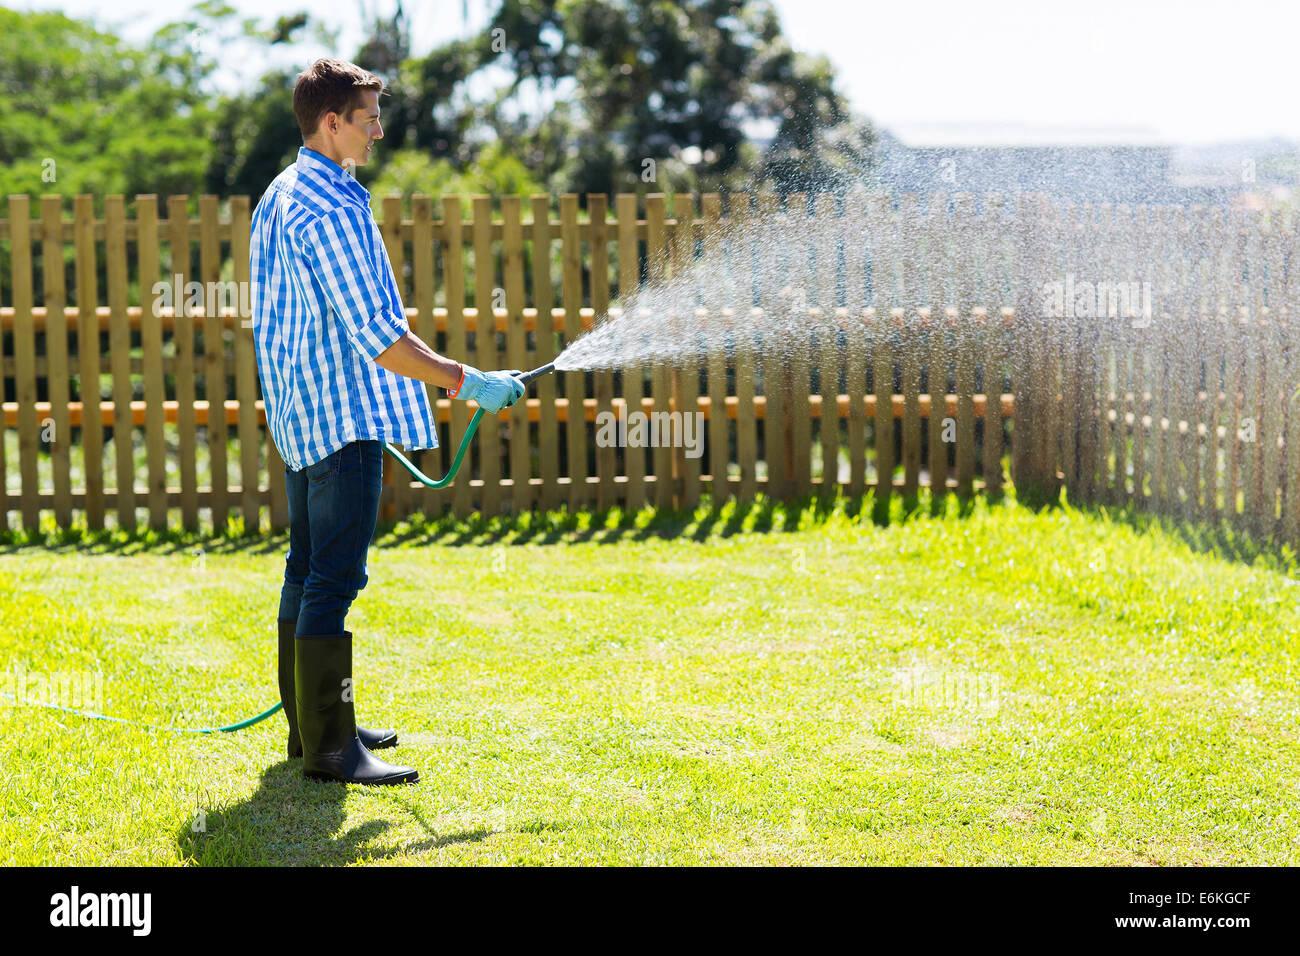 young man watering backyard lawn using hosepipe stock photo